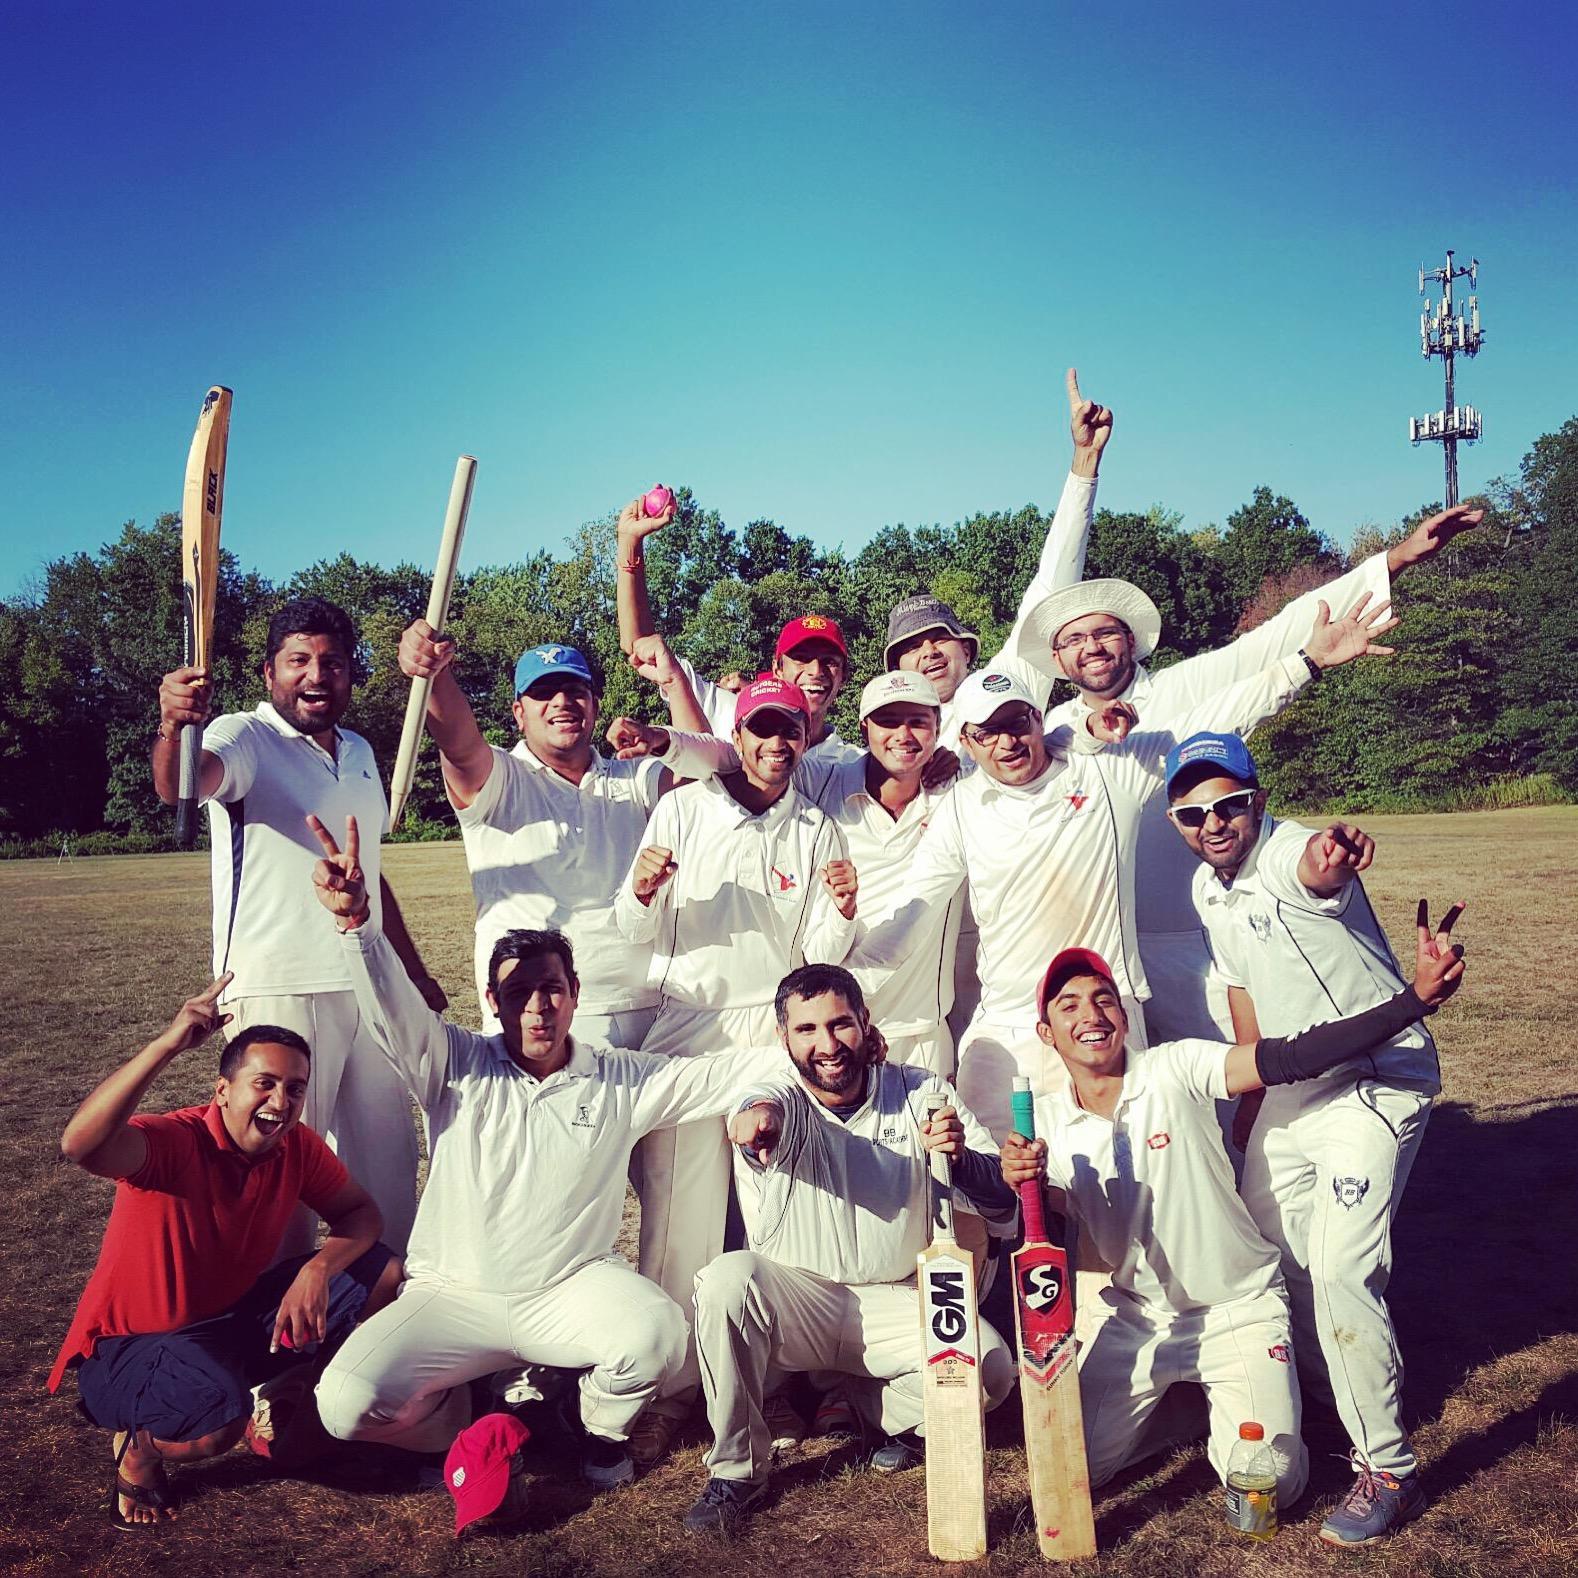 Miracle Cricket Club